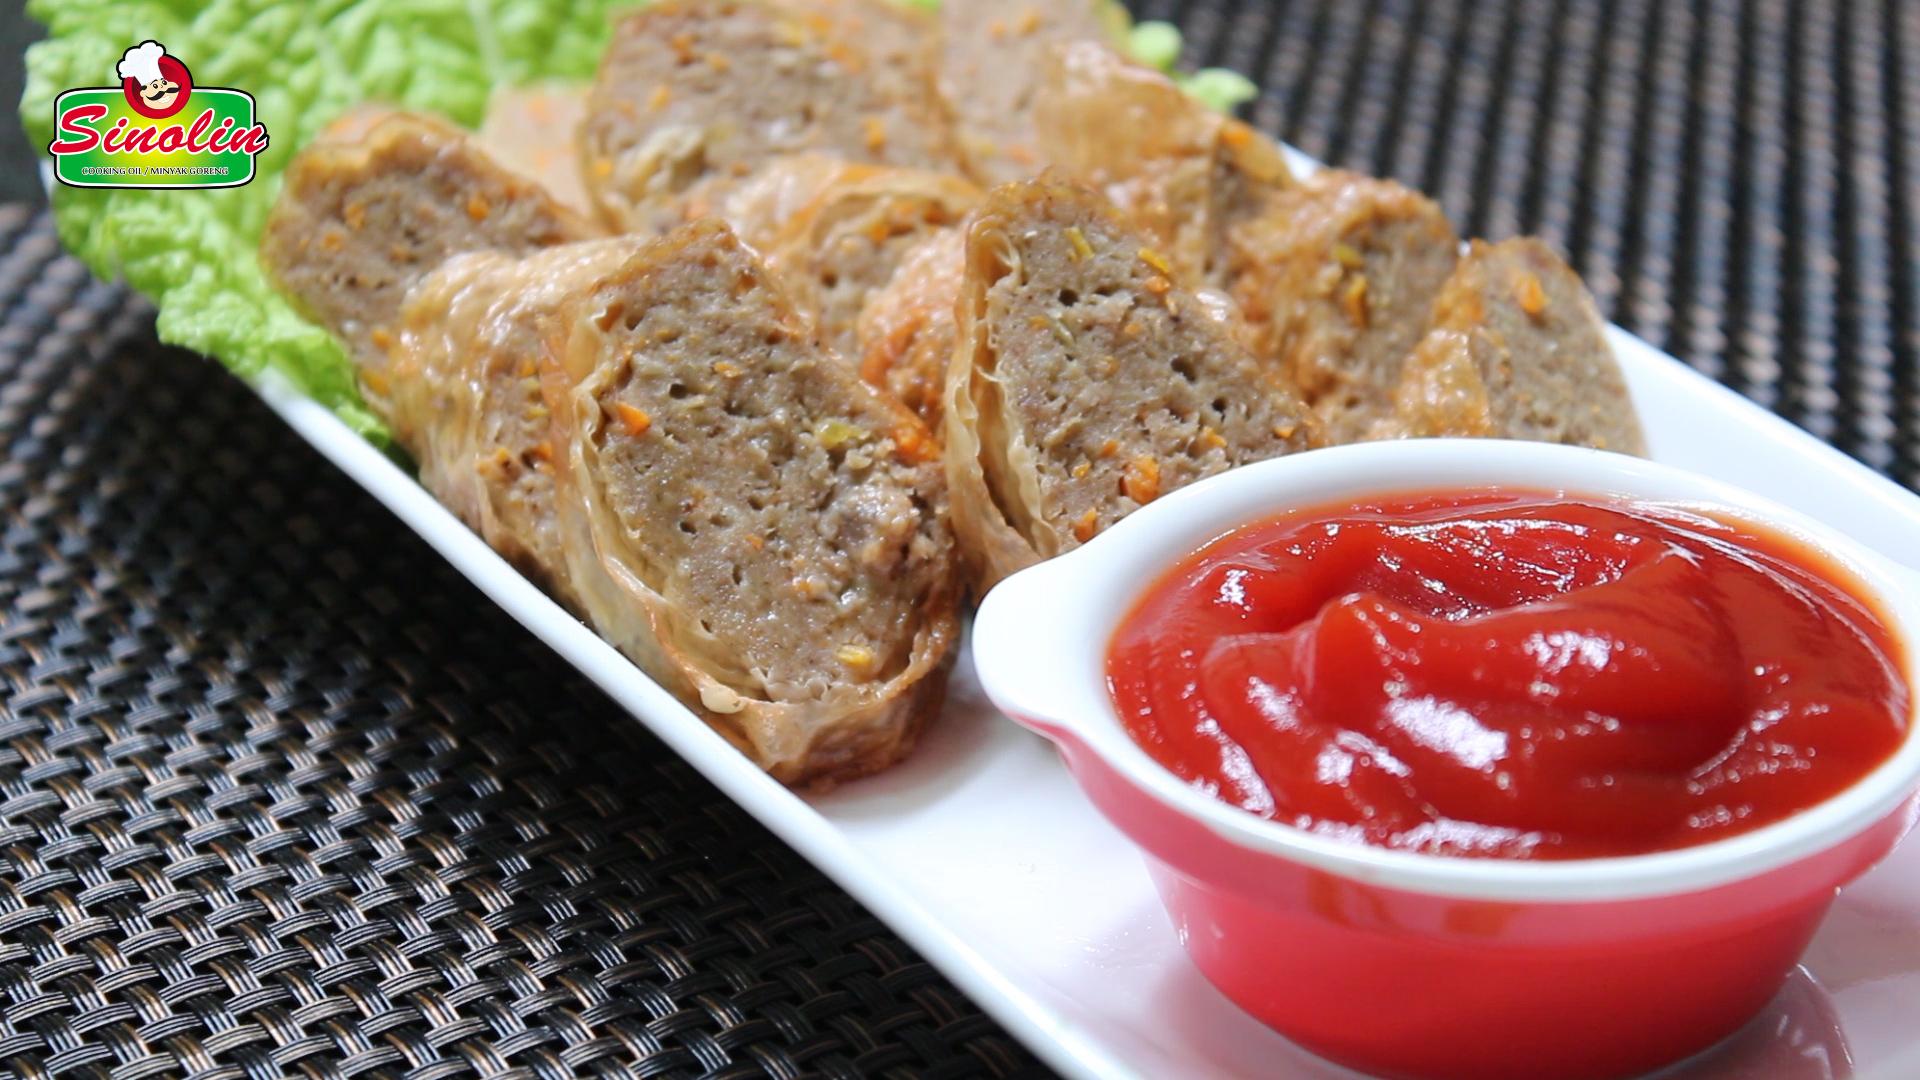 CHINESE MEAT ROLLS 五香肉卷 by Dapur Sinolin